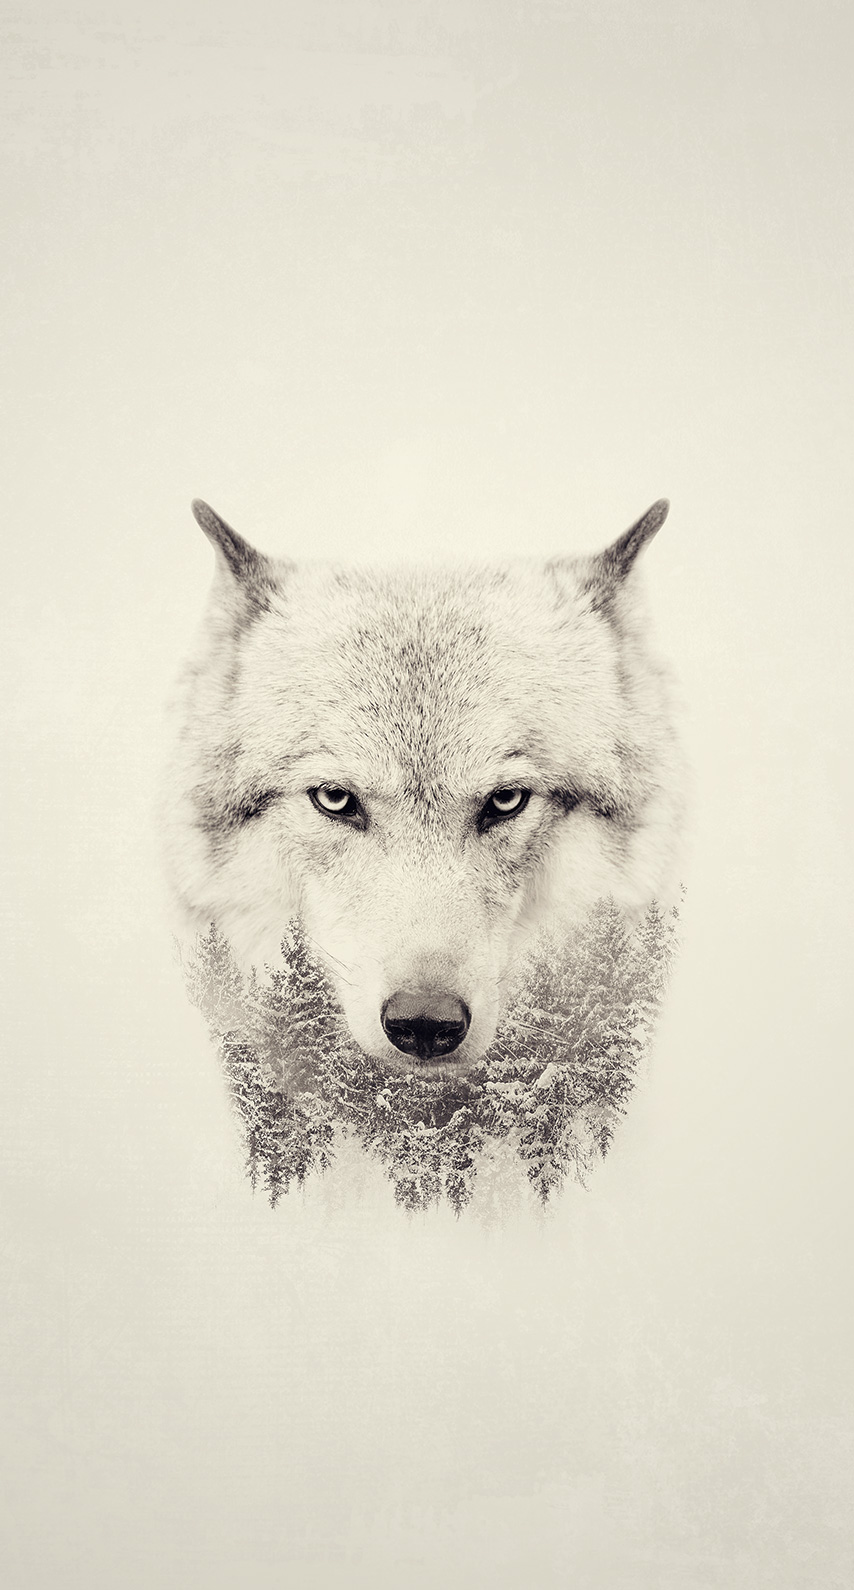 monochrome, portrait, wildlife, mammal, predator, canine, canis